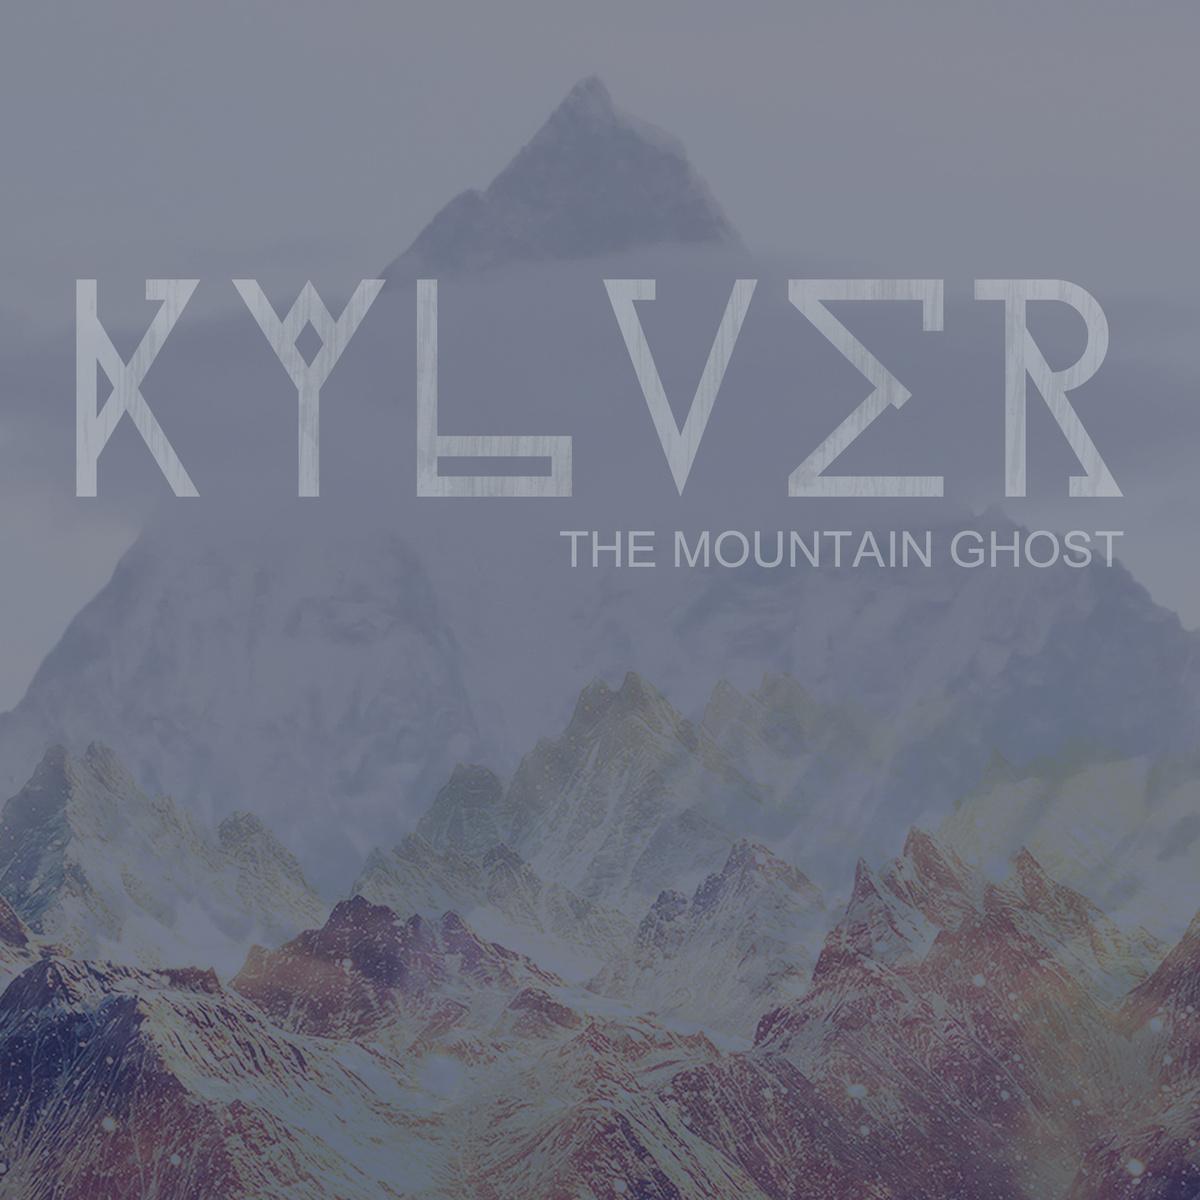 Kylver: The Mountain Ghost